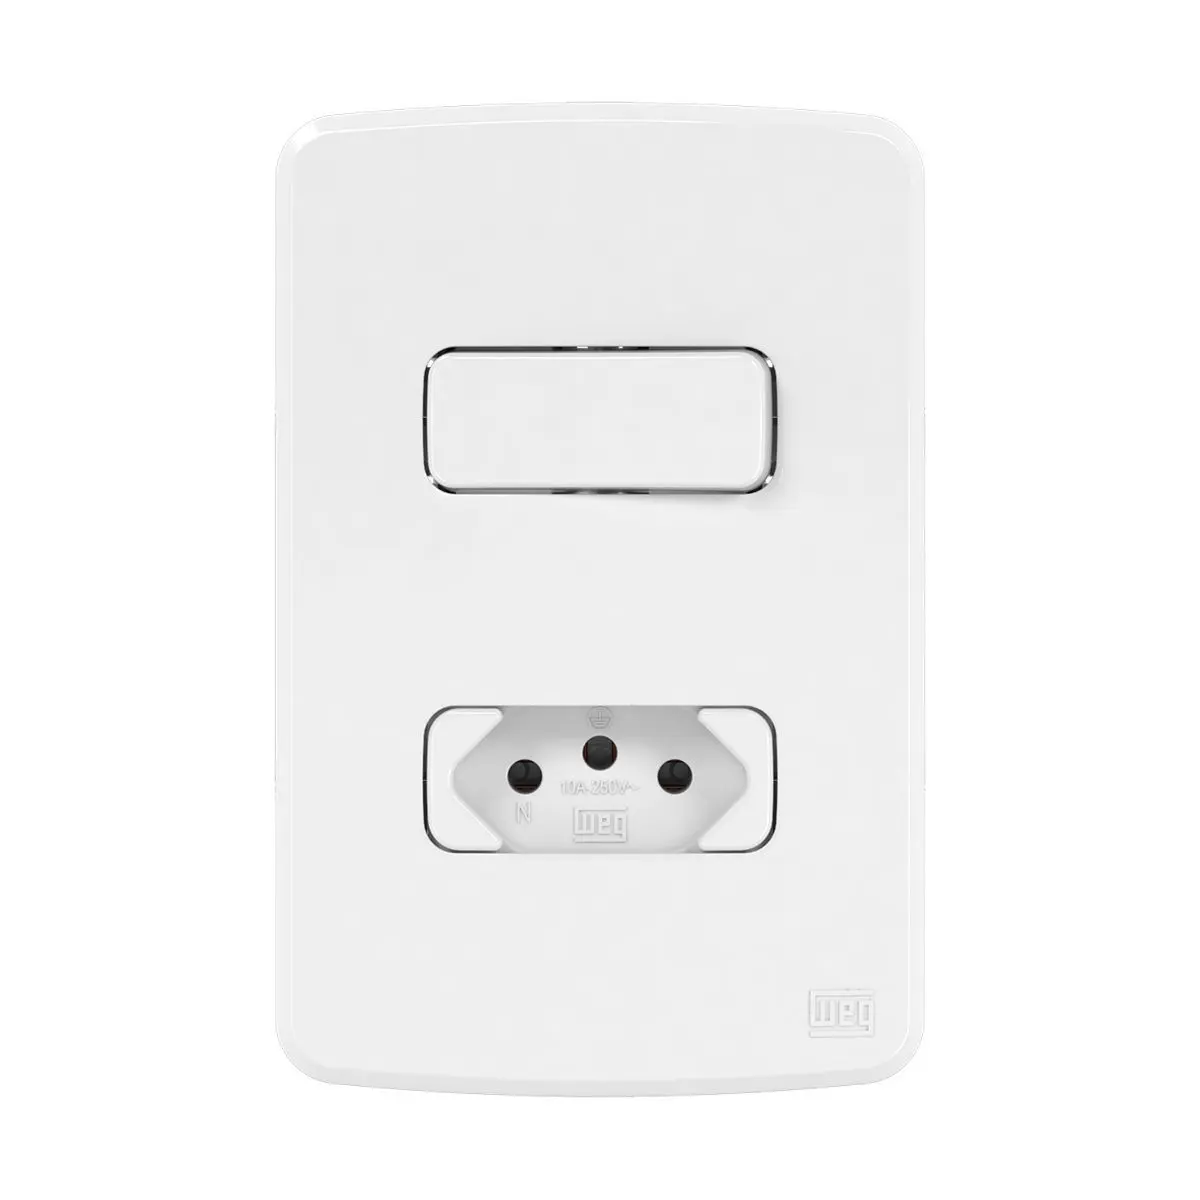 1 Interruptor Simples+Tomada 10A Placa 4X2 Composé Br